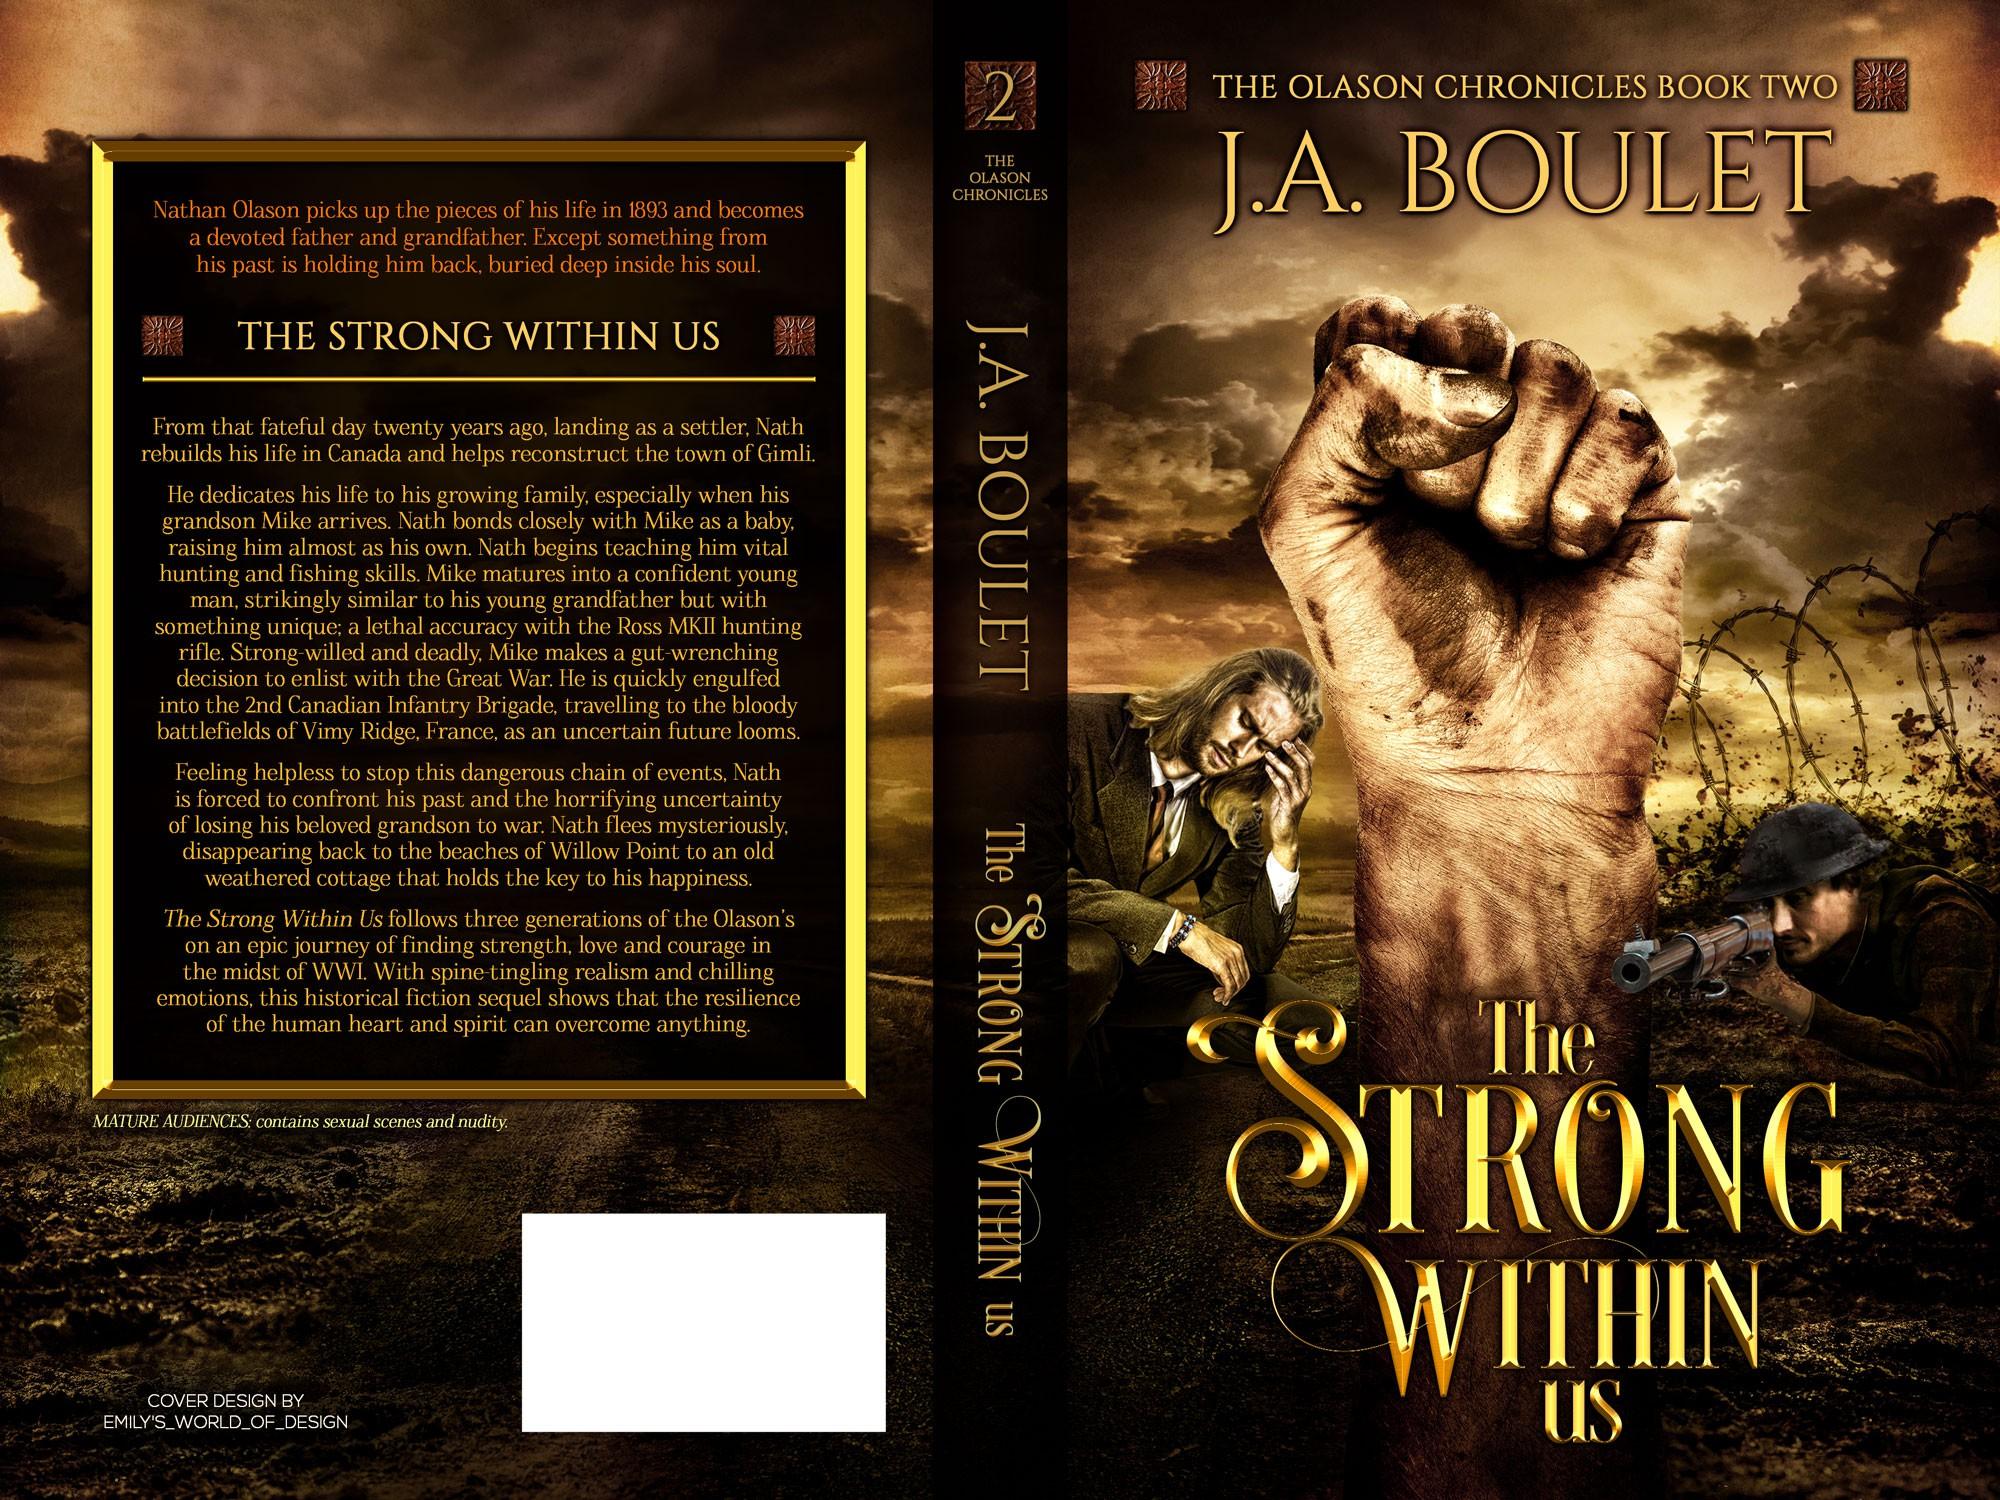 Book cover design b02